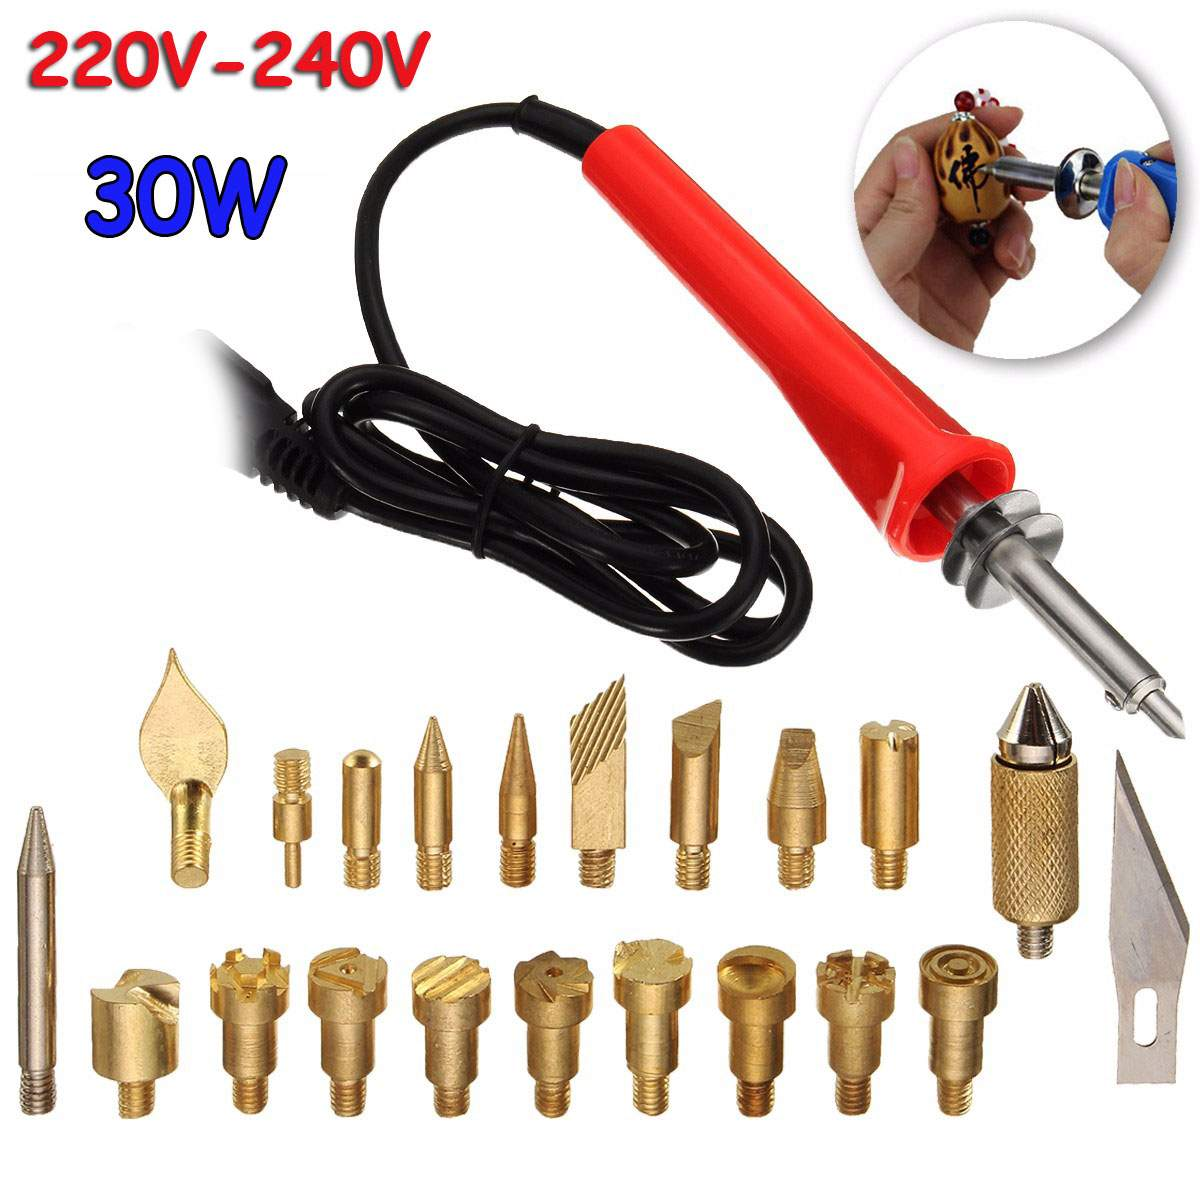 23pcs 220V 30W Wood Burning Pen Soldering Tool Set Pyrography Kit Brass With Tips Blade Tweezers Bracket